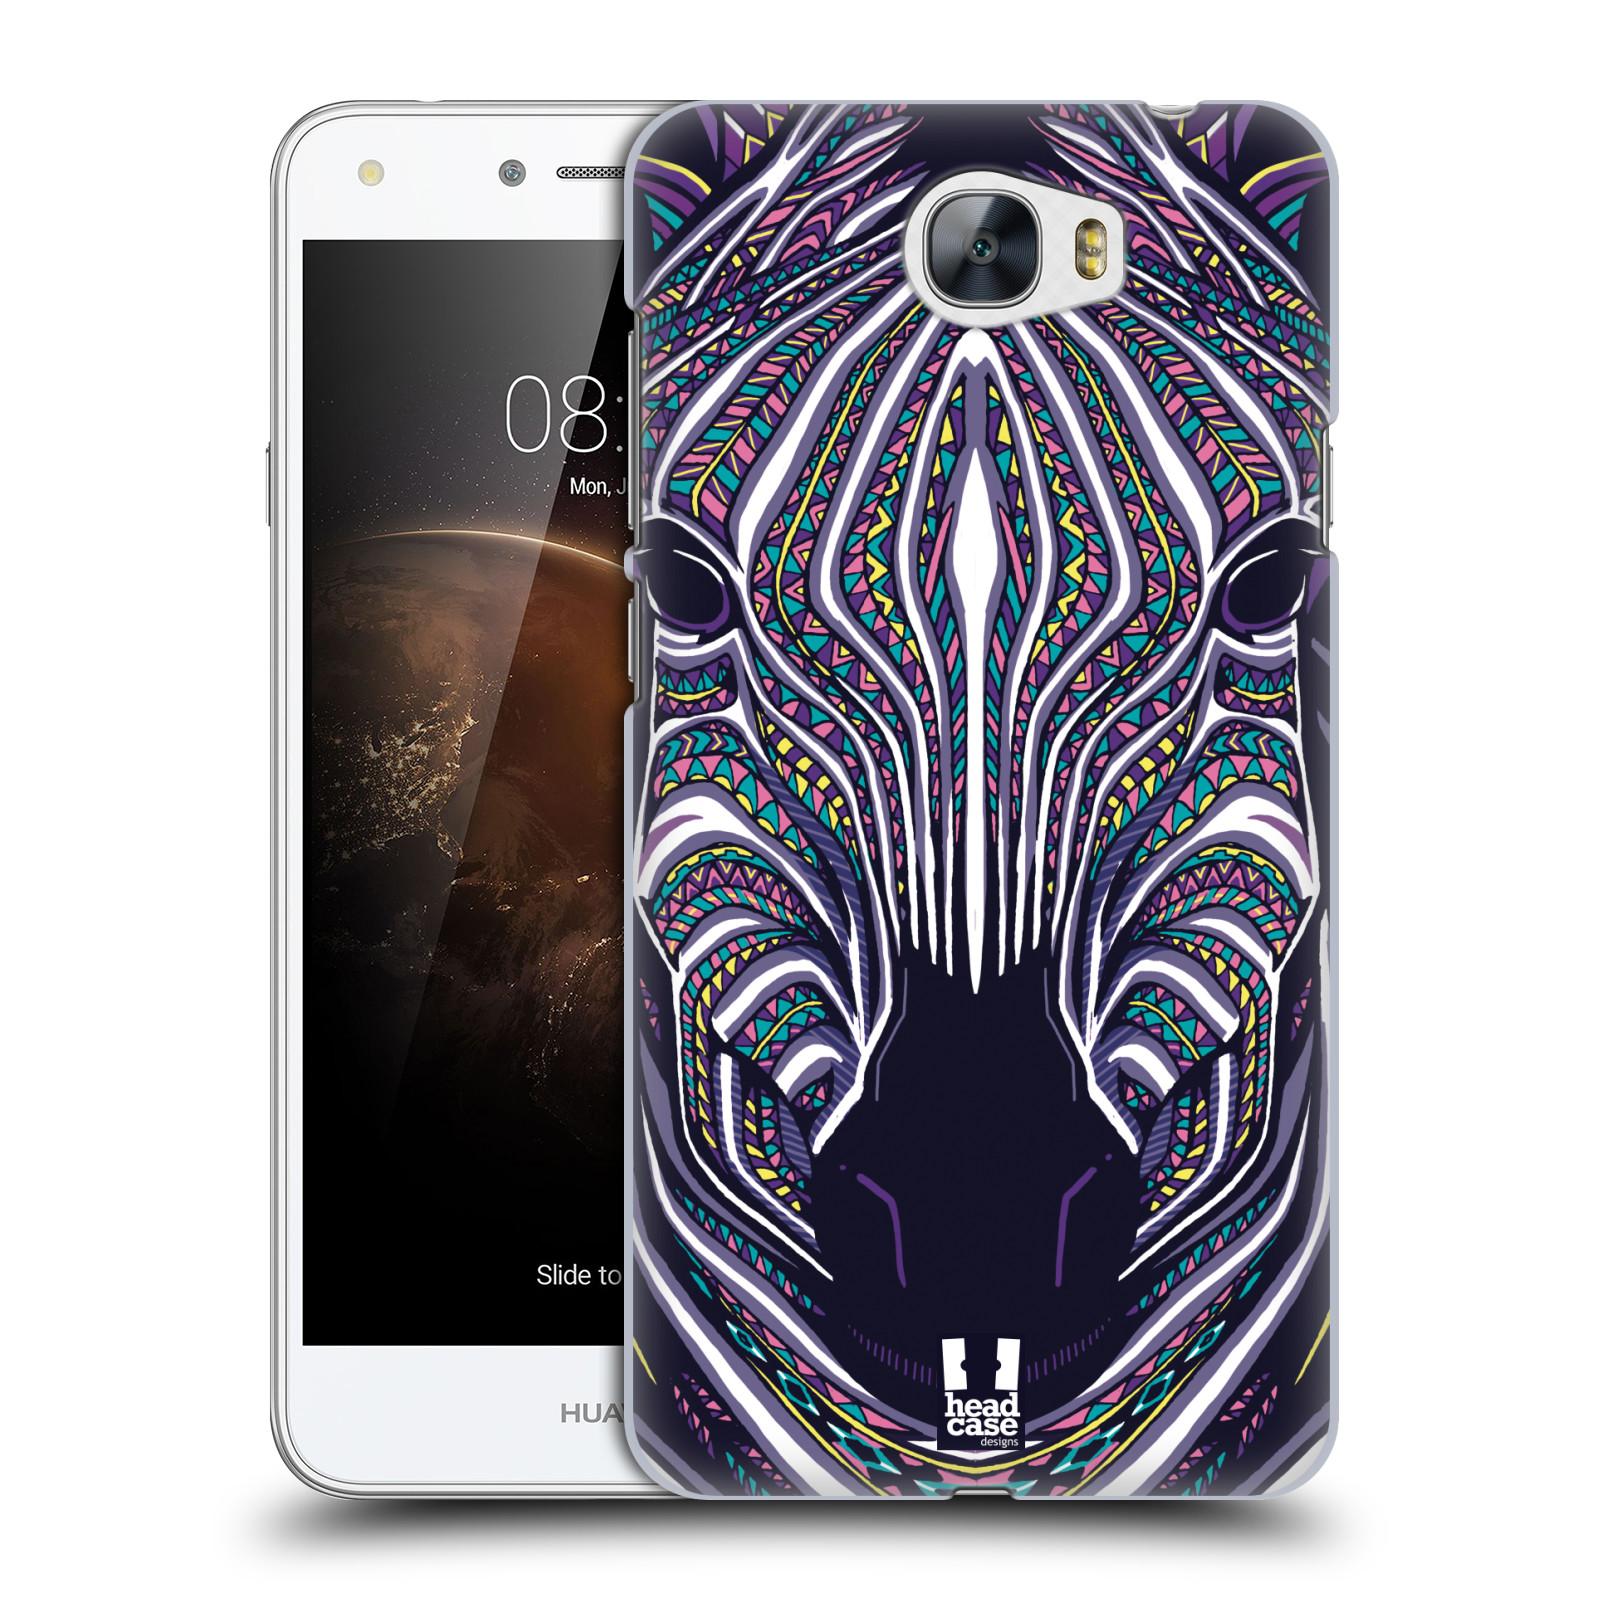 Plastové pouzdro na mobil Huawei Y6 II Compact HEAD CASE AZTEC ZEBRA